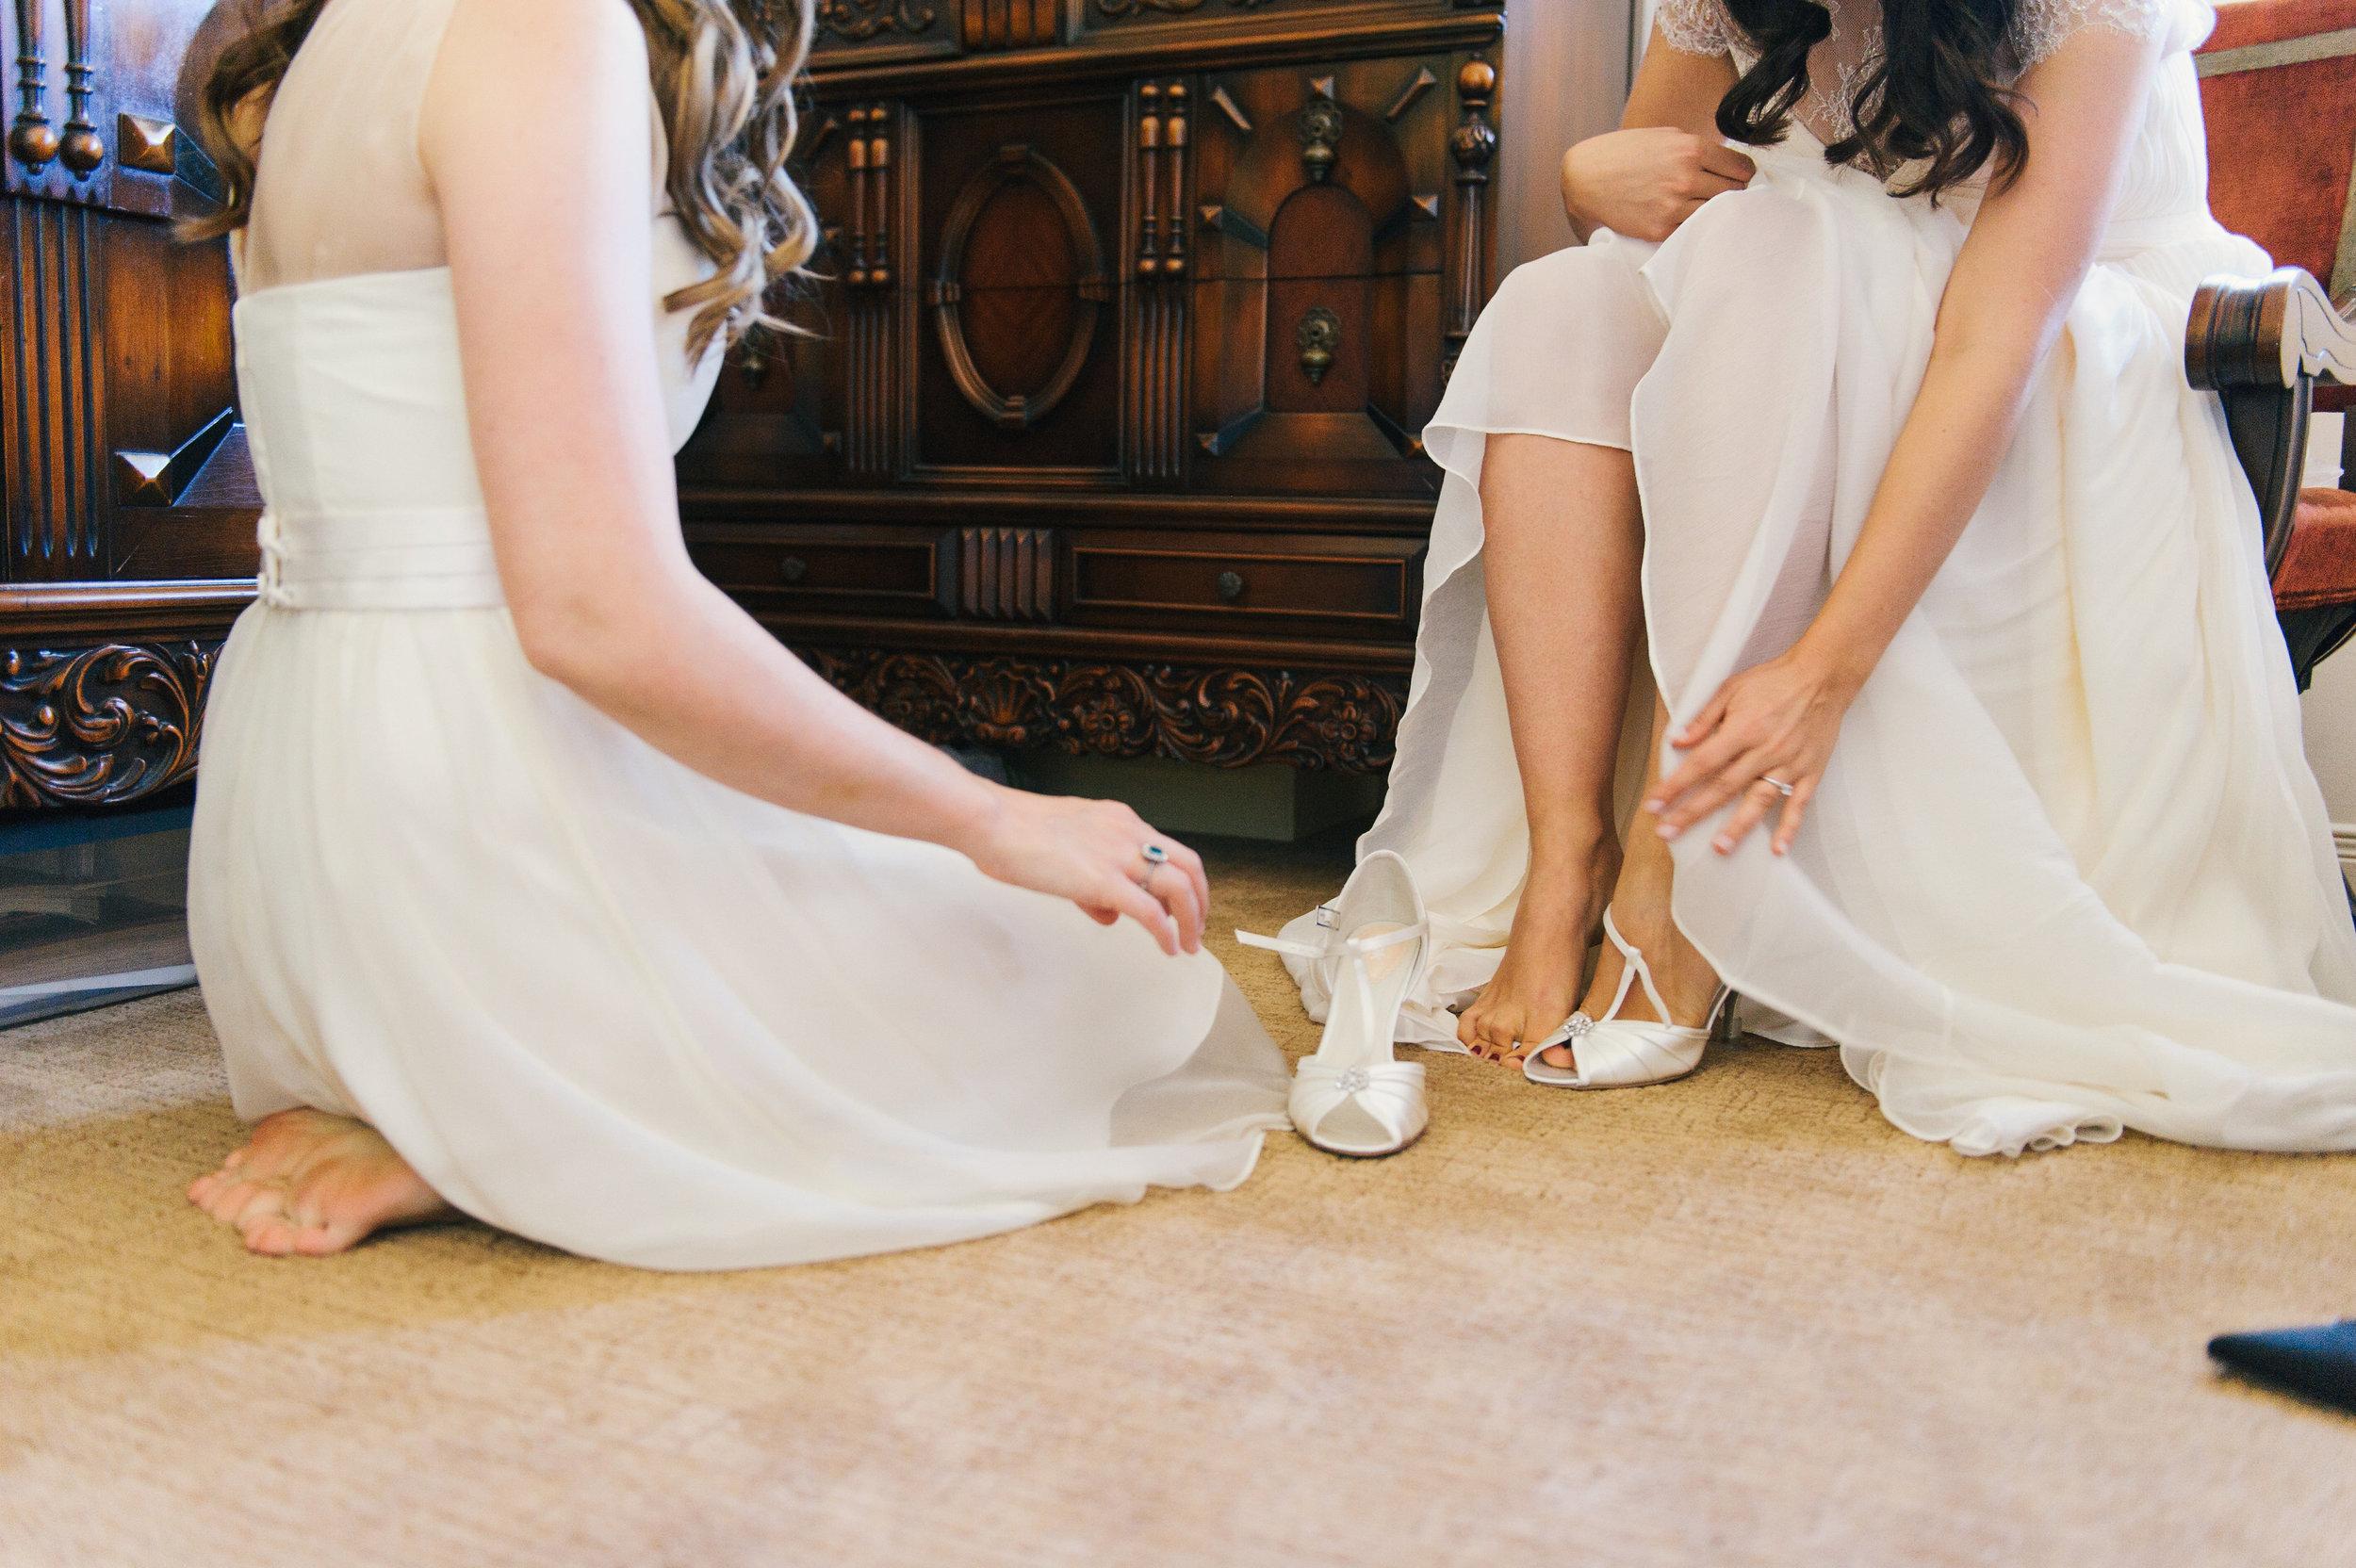 marial-daniel-wedding-balls-falls-sara-wilde-photography-0035.jpg